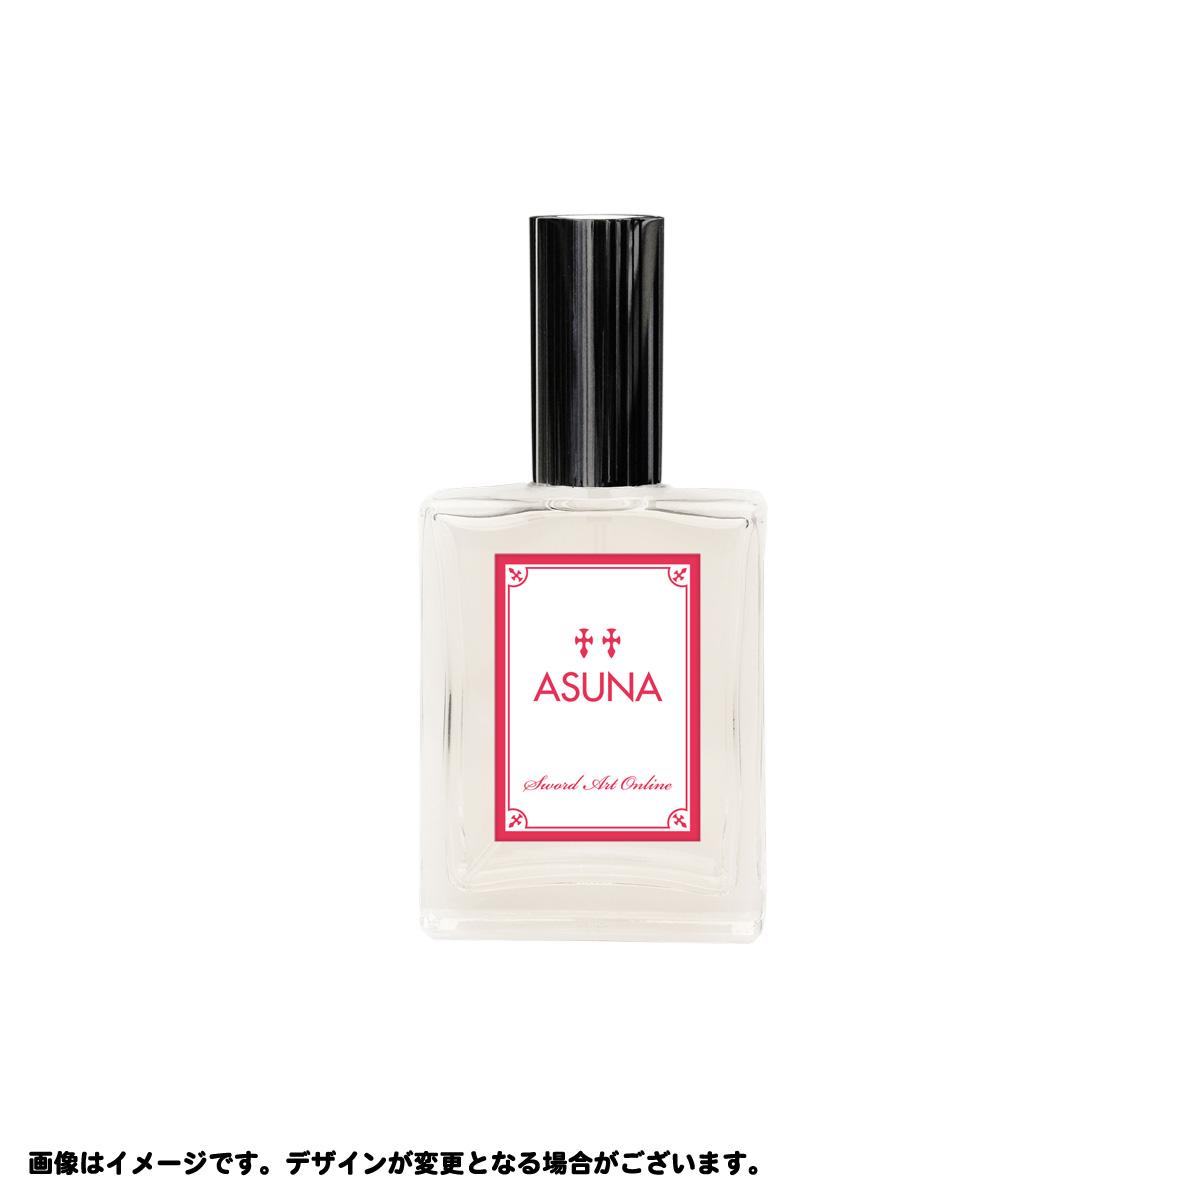 Sword-Art-Online-II-Perfume-Asuna